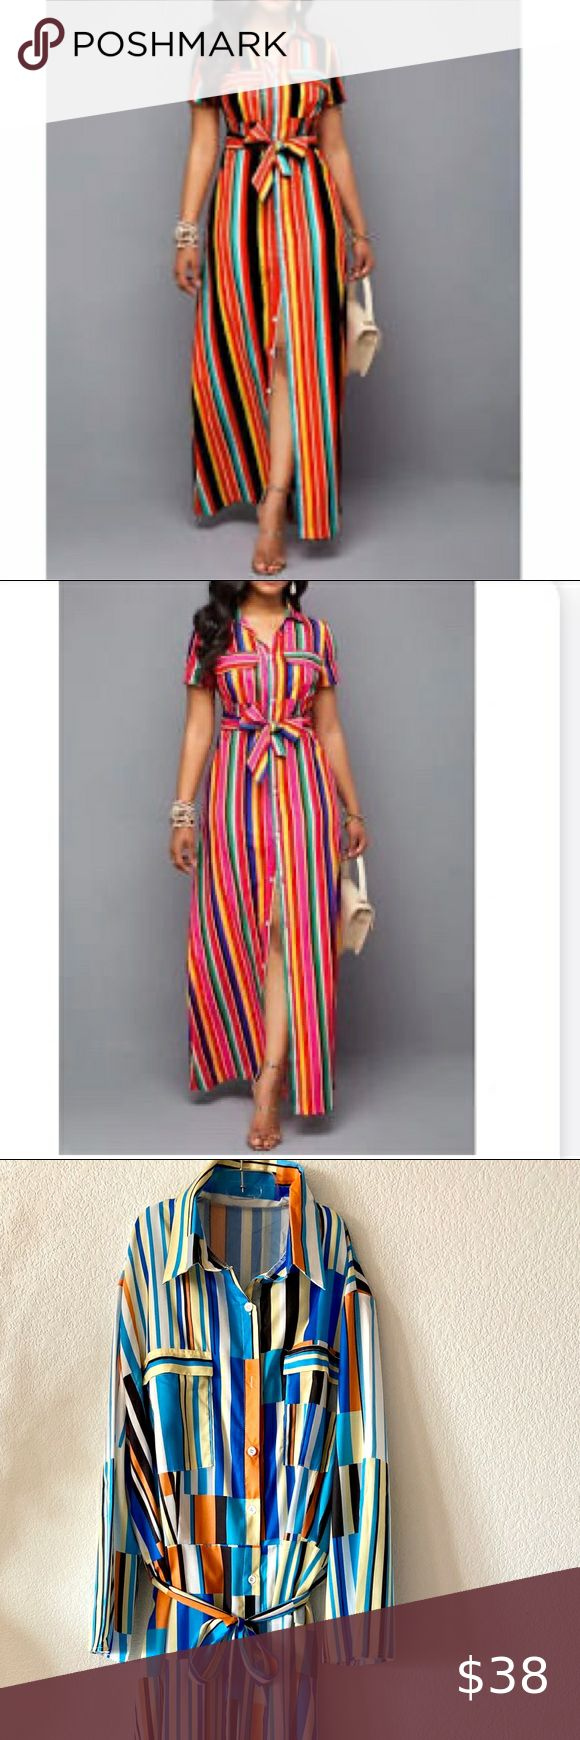 Plus Size Belted Rainbow Stripe Maxi Dress In 2020 Striped Maxi Dresses Striped Maxi Plus Size Belts [ 1740 x 580 Pixel ]